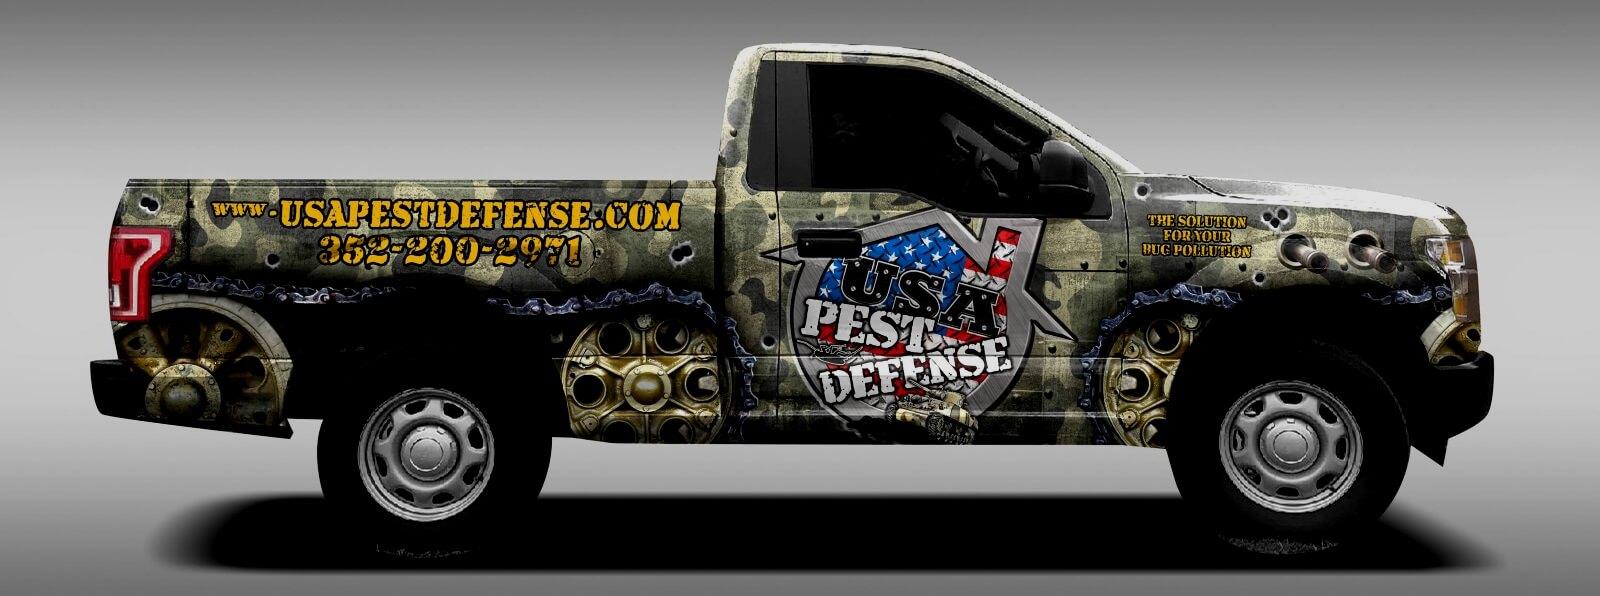 USA Pest Defense - Pest Control Services in Ocala, Florida